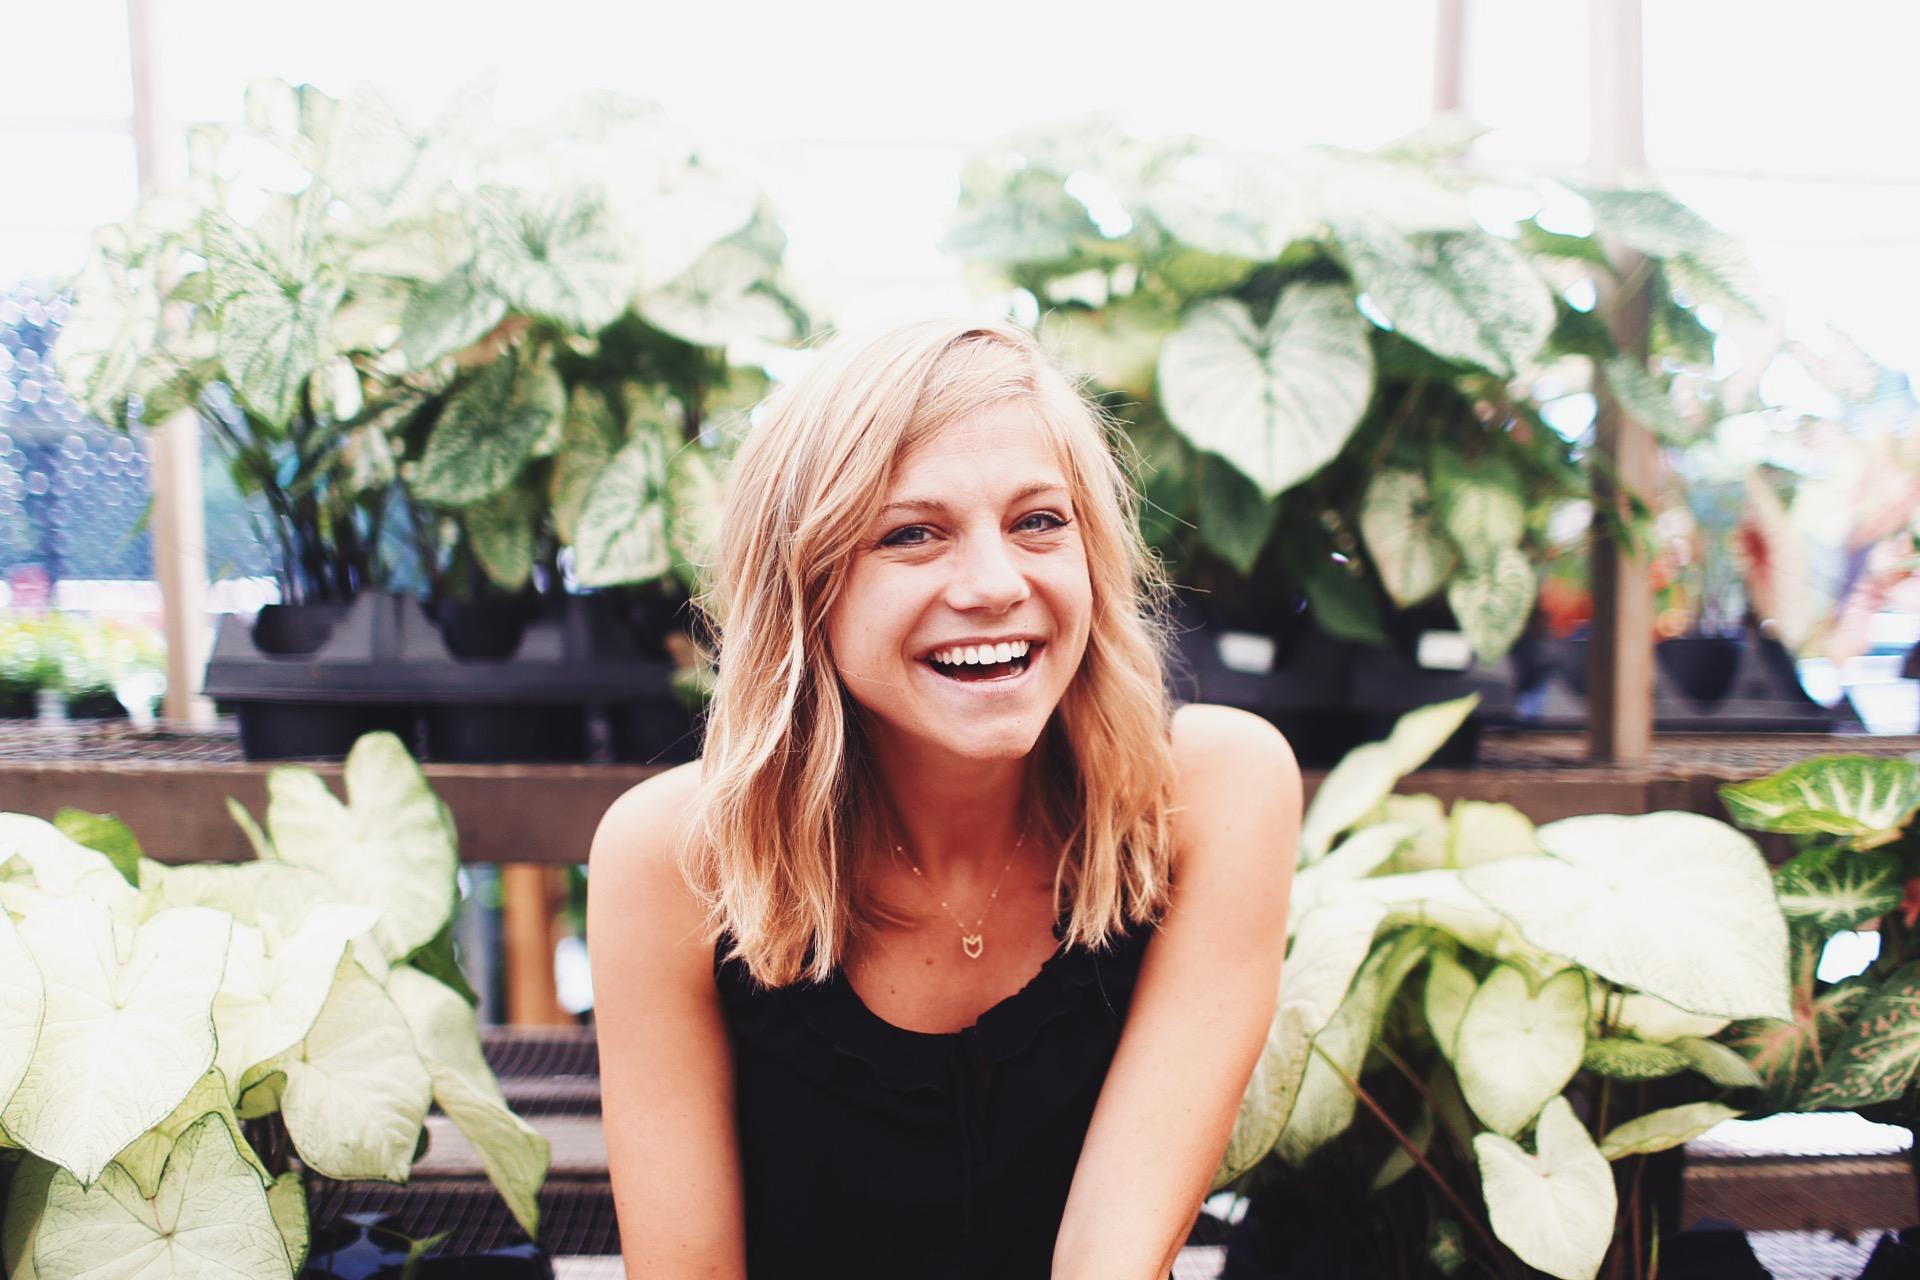 Allie Heemstra | Allie Illuminates